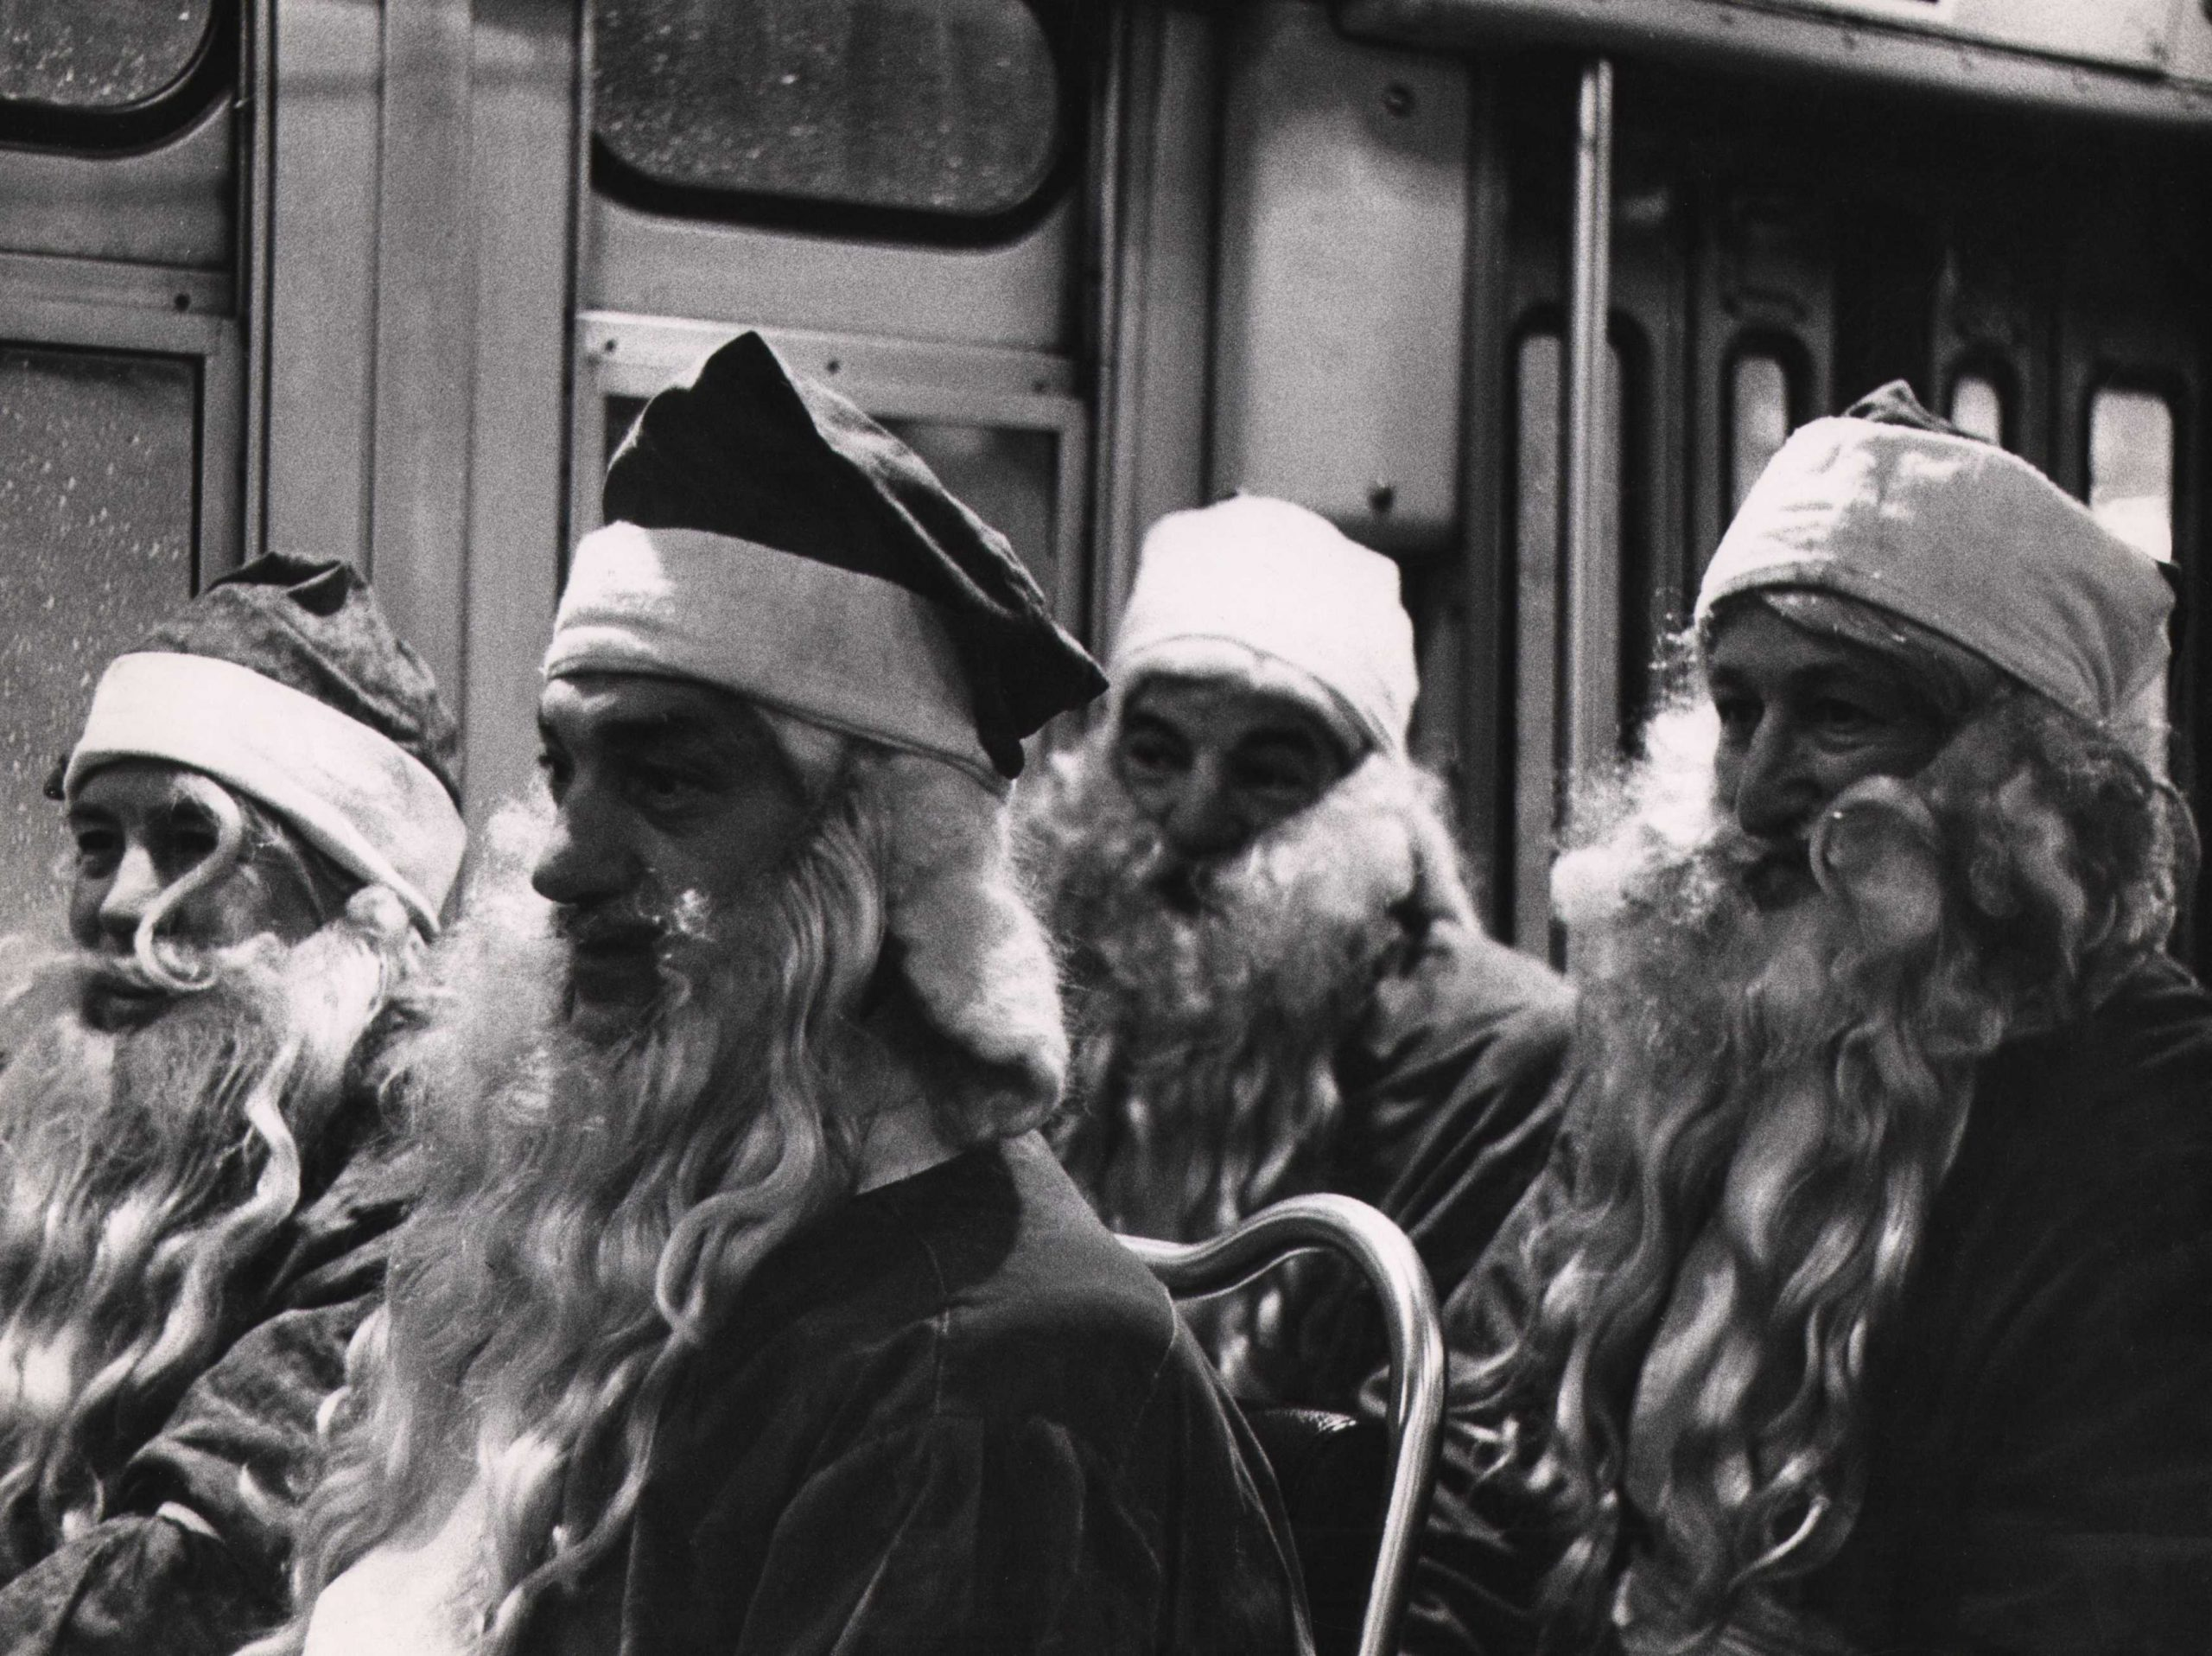 Bedrich Grunzweig, Four Santas in a New York Bus, Christmas, 1954